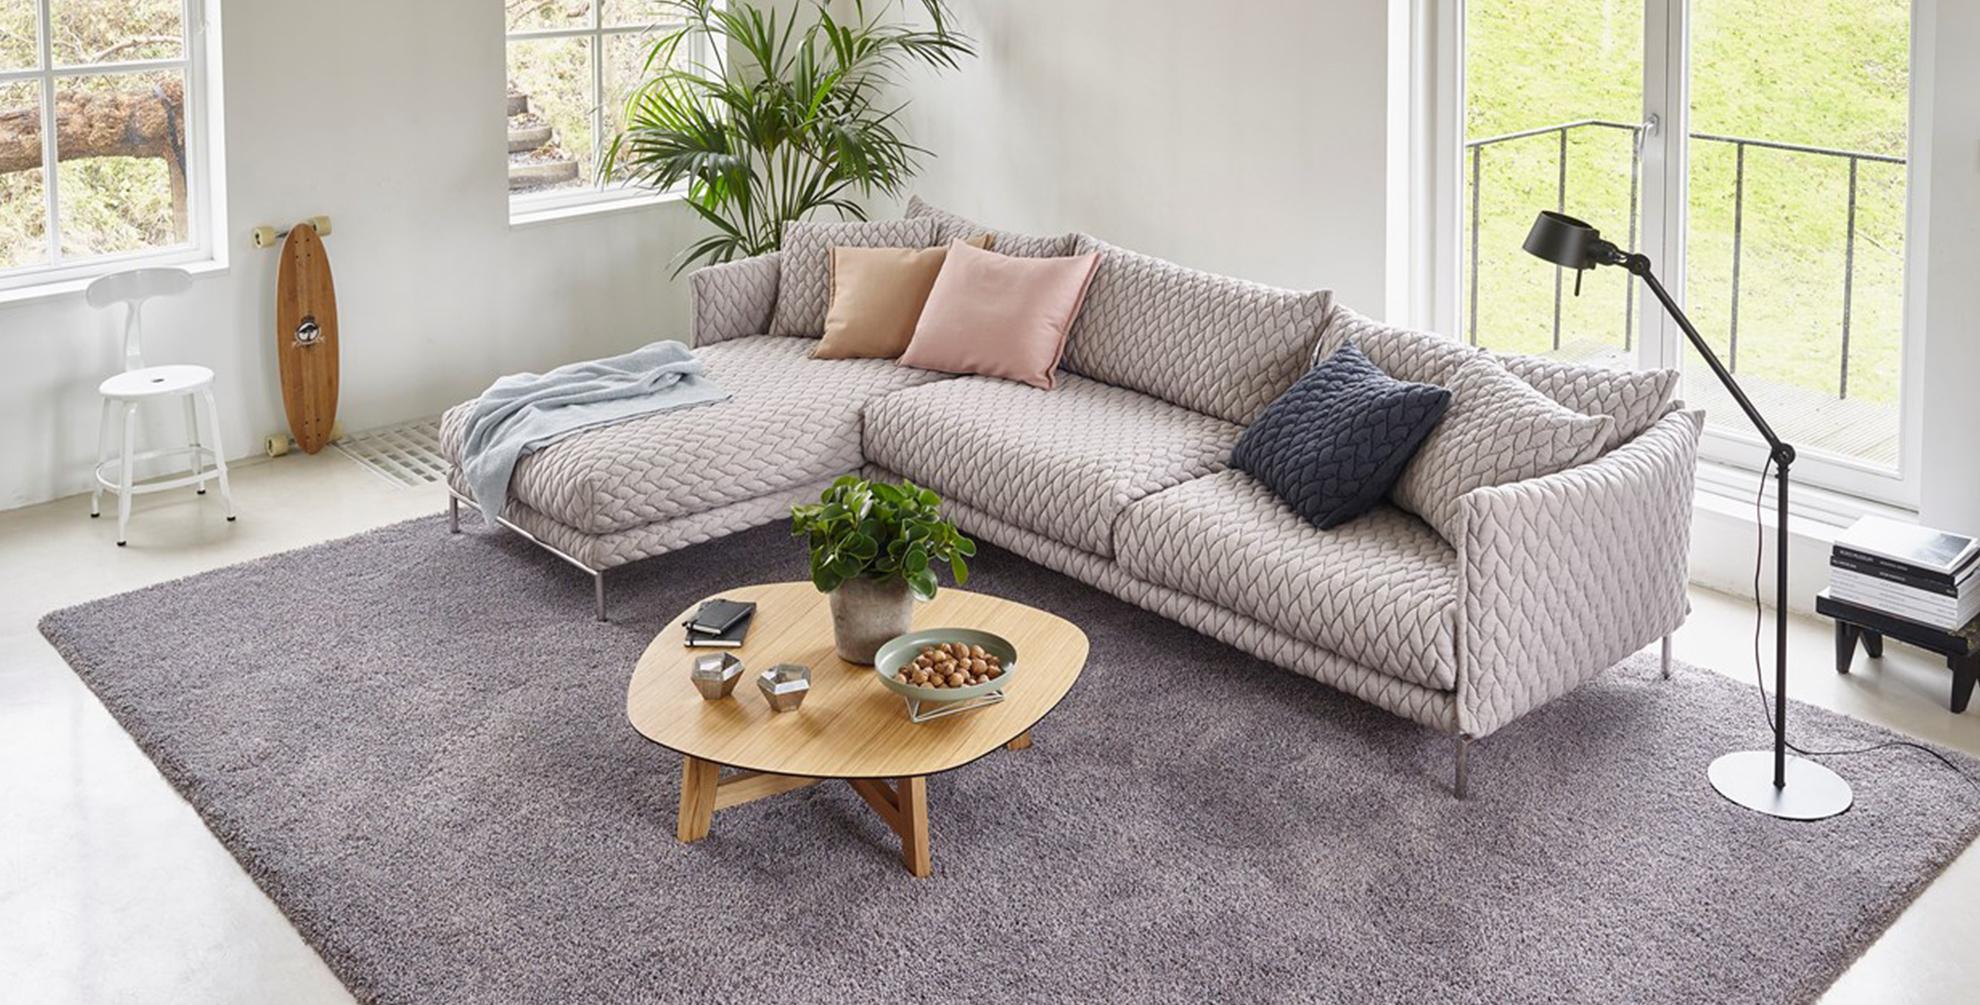 Voor elke <b>vloer</b> een passend <b>karpet</b>